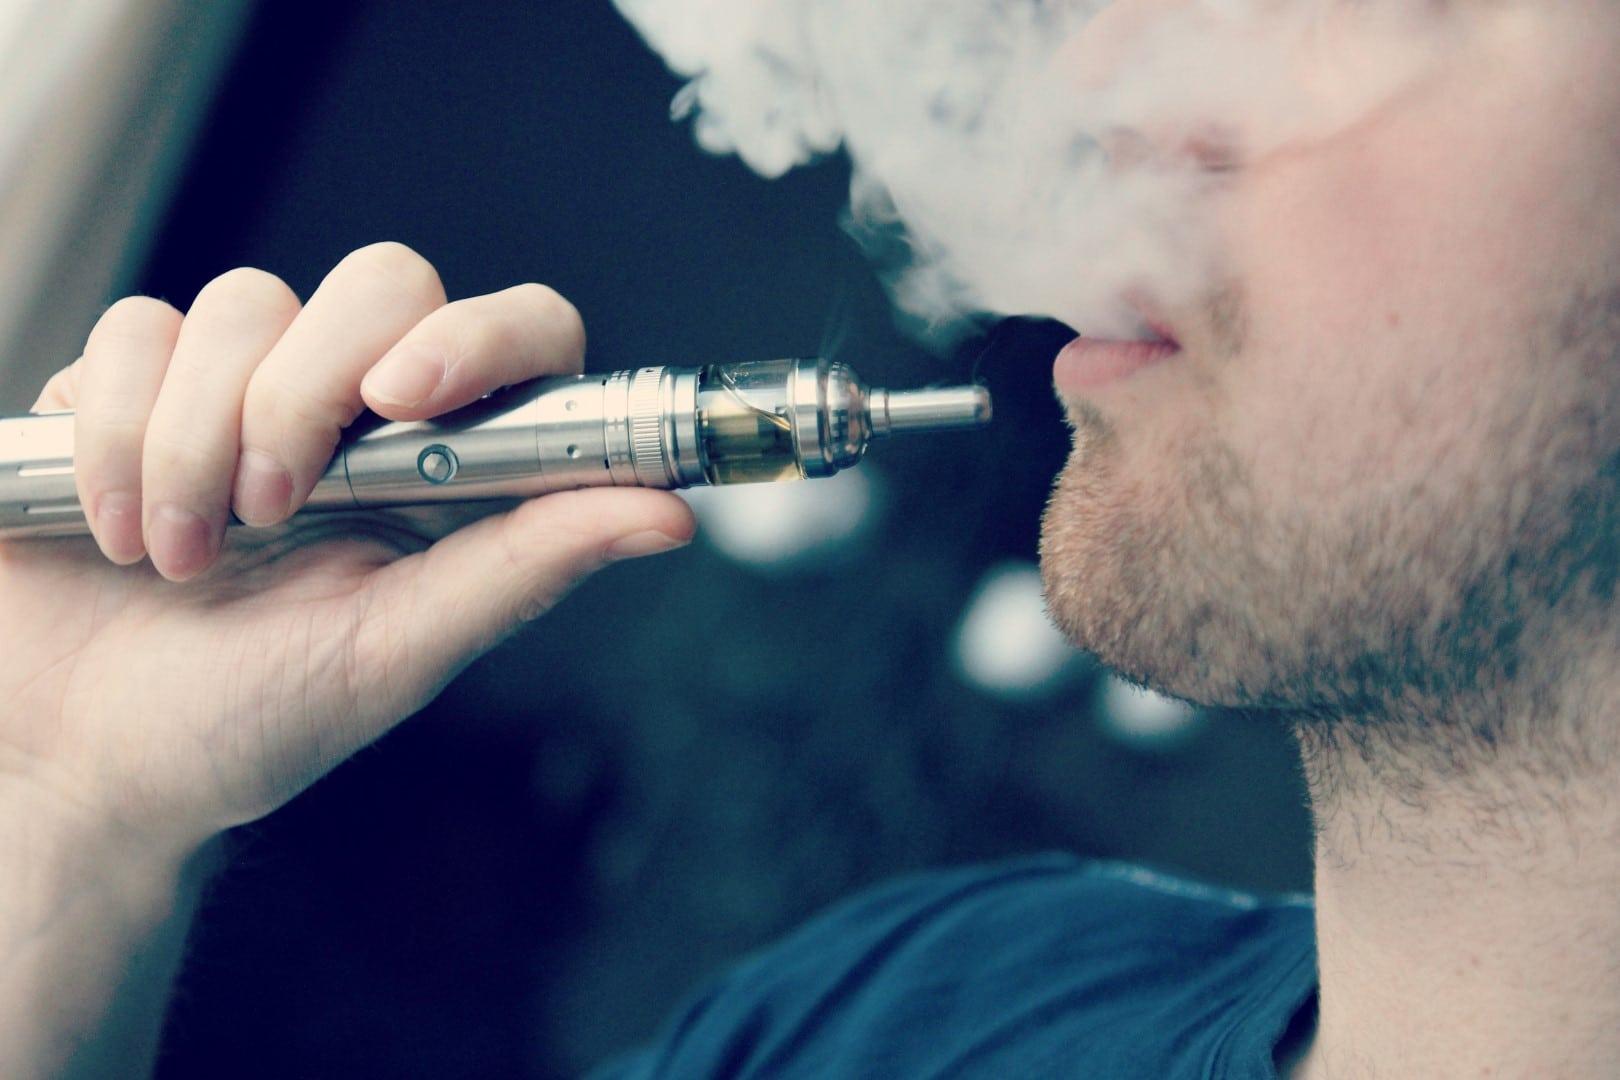 e-cigarette-electronic_cigarette-e-cigs-e-liquid-vaping-cloud_chasing_16323004716